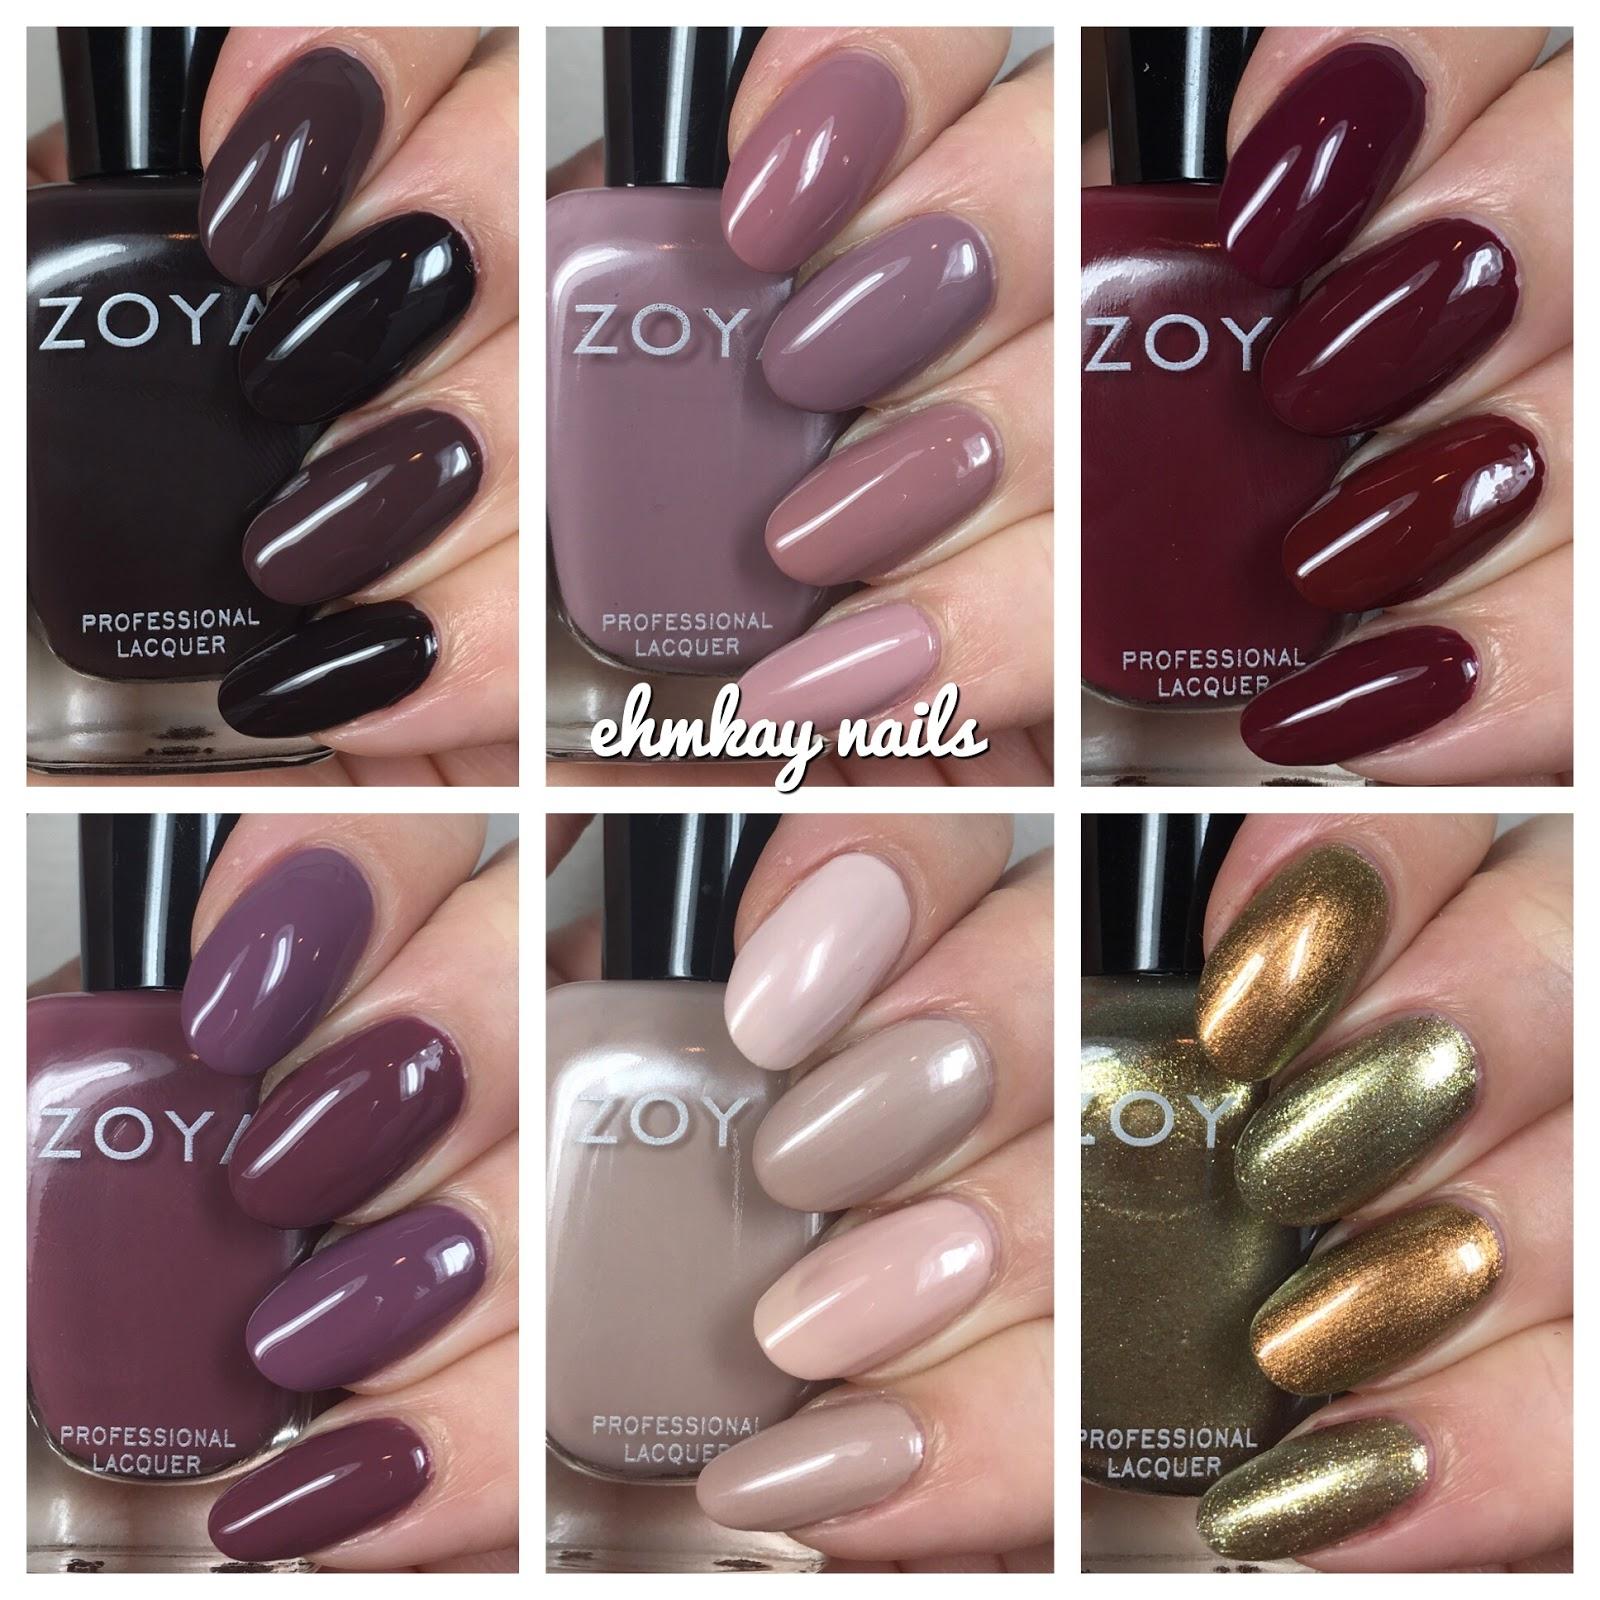 ehmkay nails: Zoya Sophisticates Comparisons